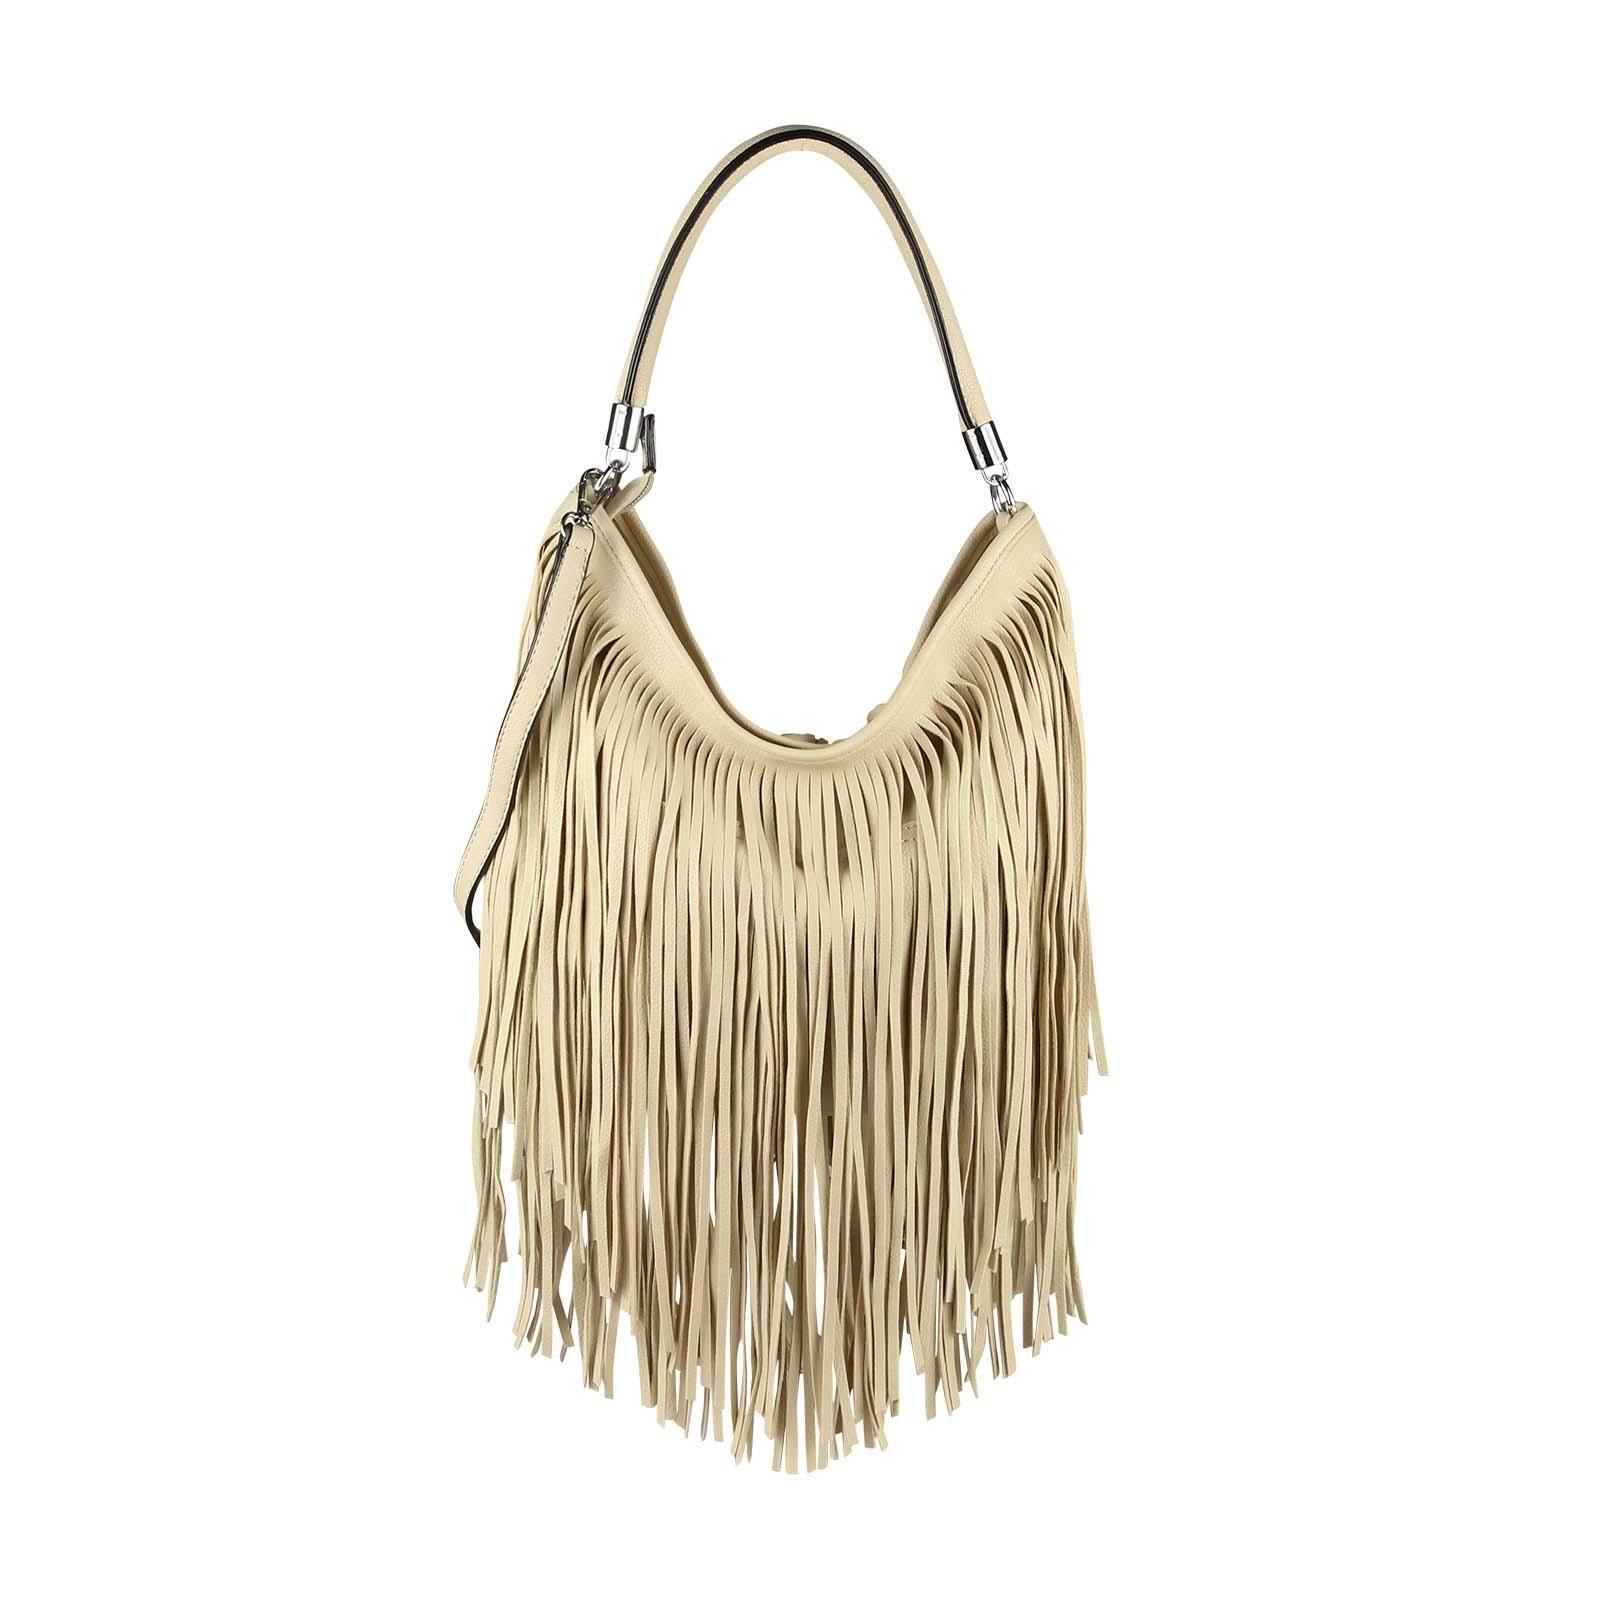 29fea50590dcb ital-design Damen Tasche Fransen Shopper Hobo-Bags Umhängetasche  Schultertasche Handtasche Henkeltasche Beige